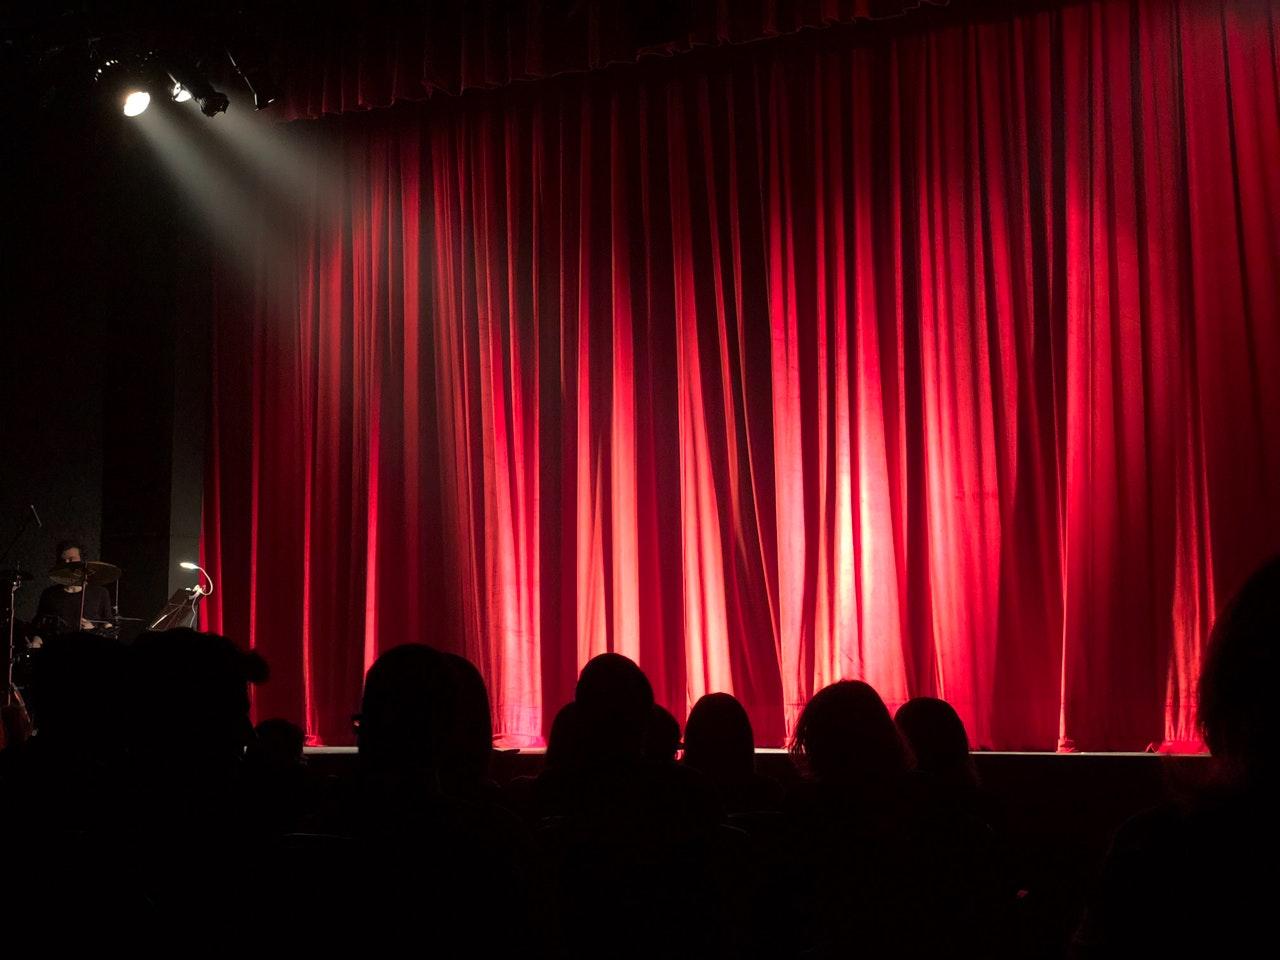 Funny Bone Comedy Club red curtains